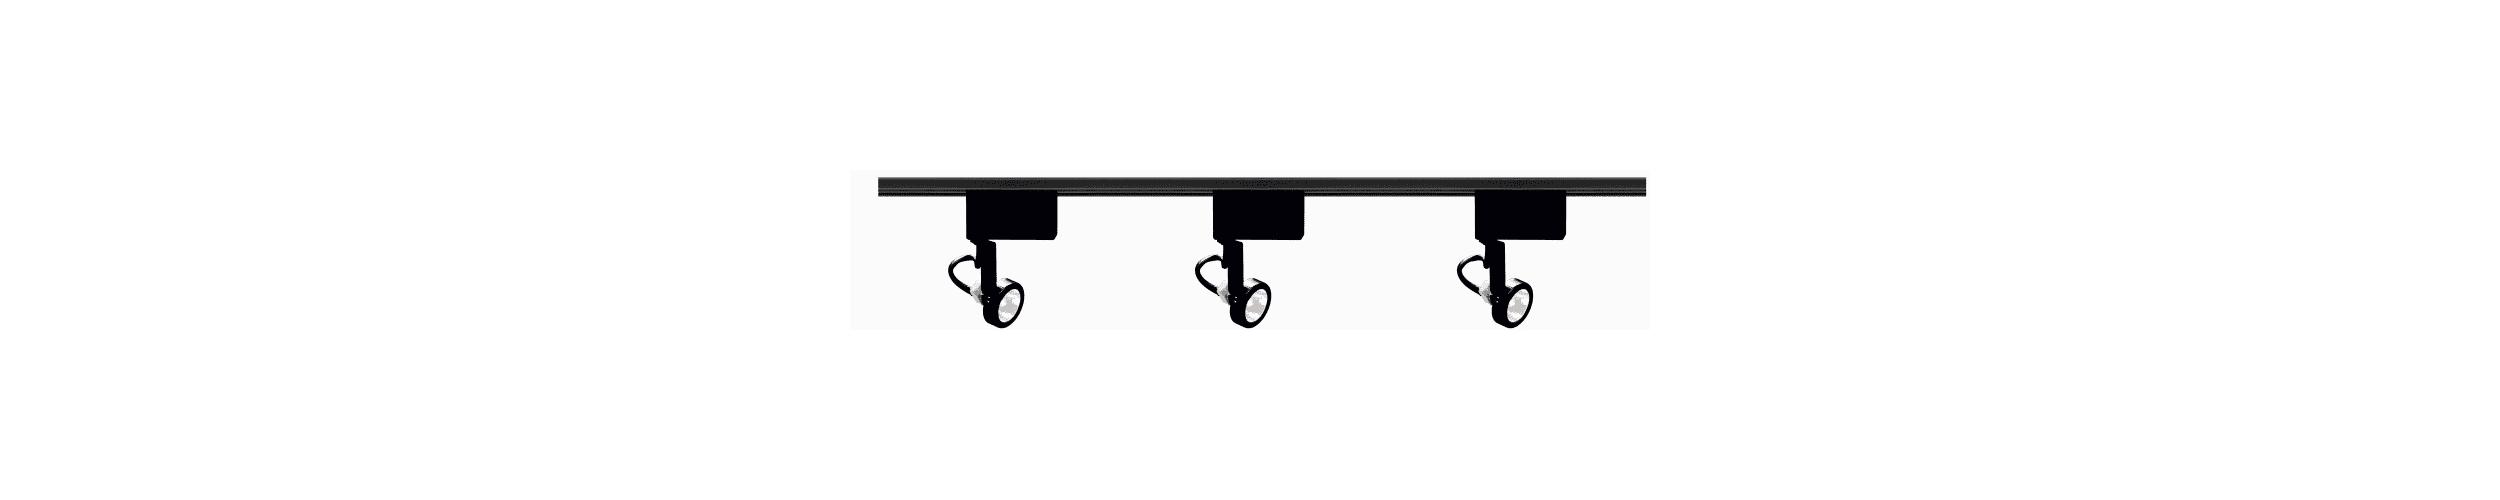 Nuvo Lighting TK315 Black Track Lighting Three Light MR16 Gimbal Ring Low Voltage Track Kit in Black Finish